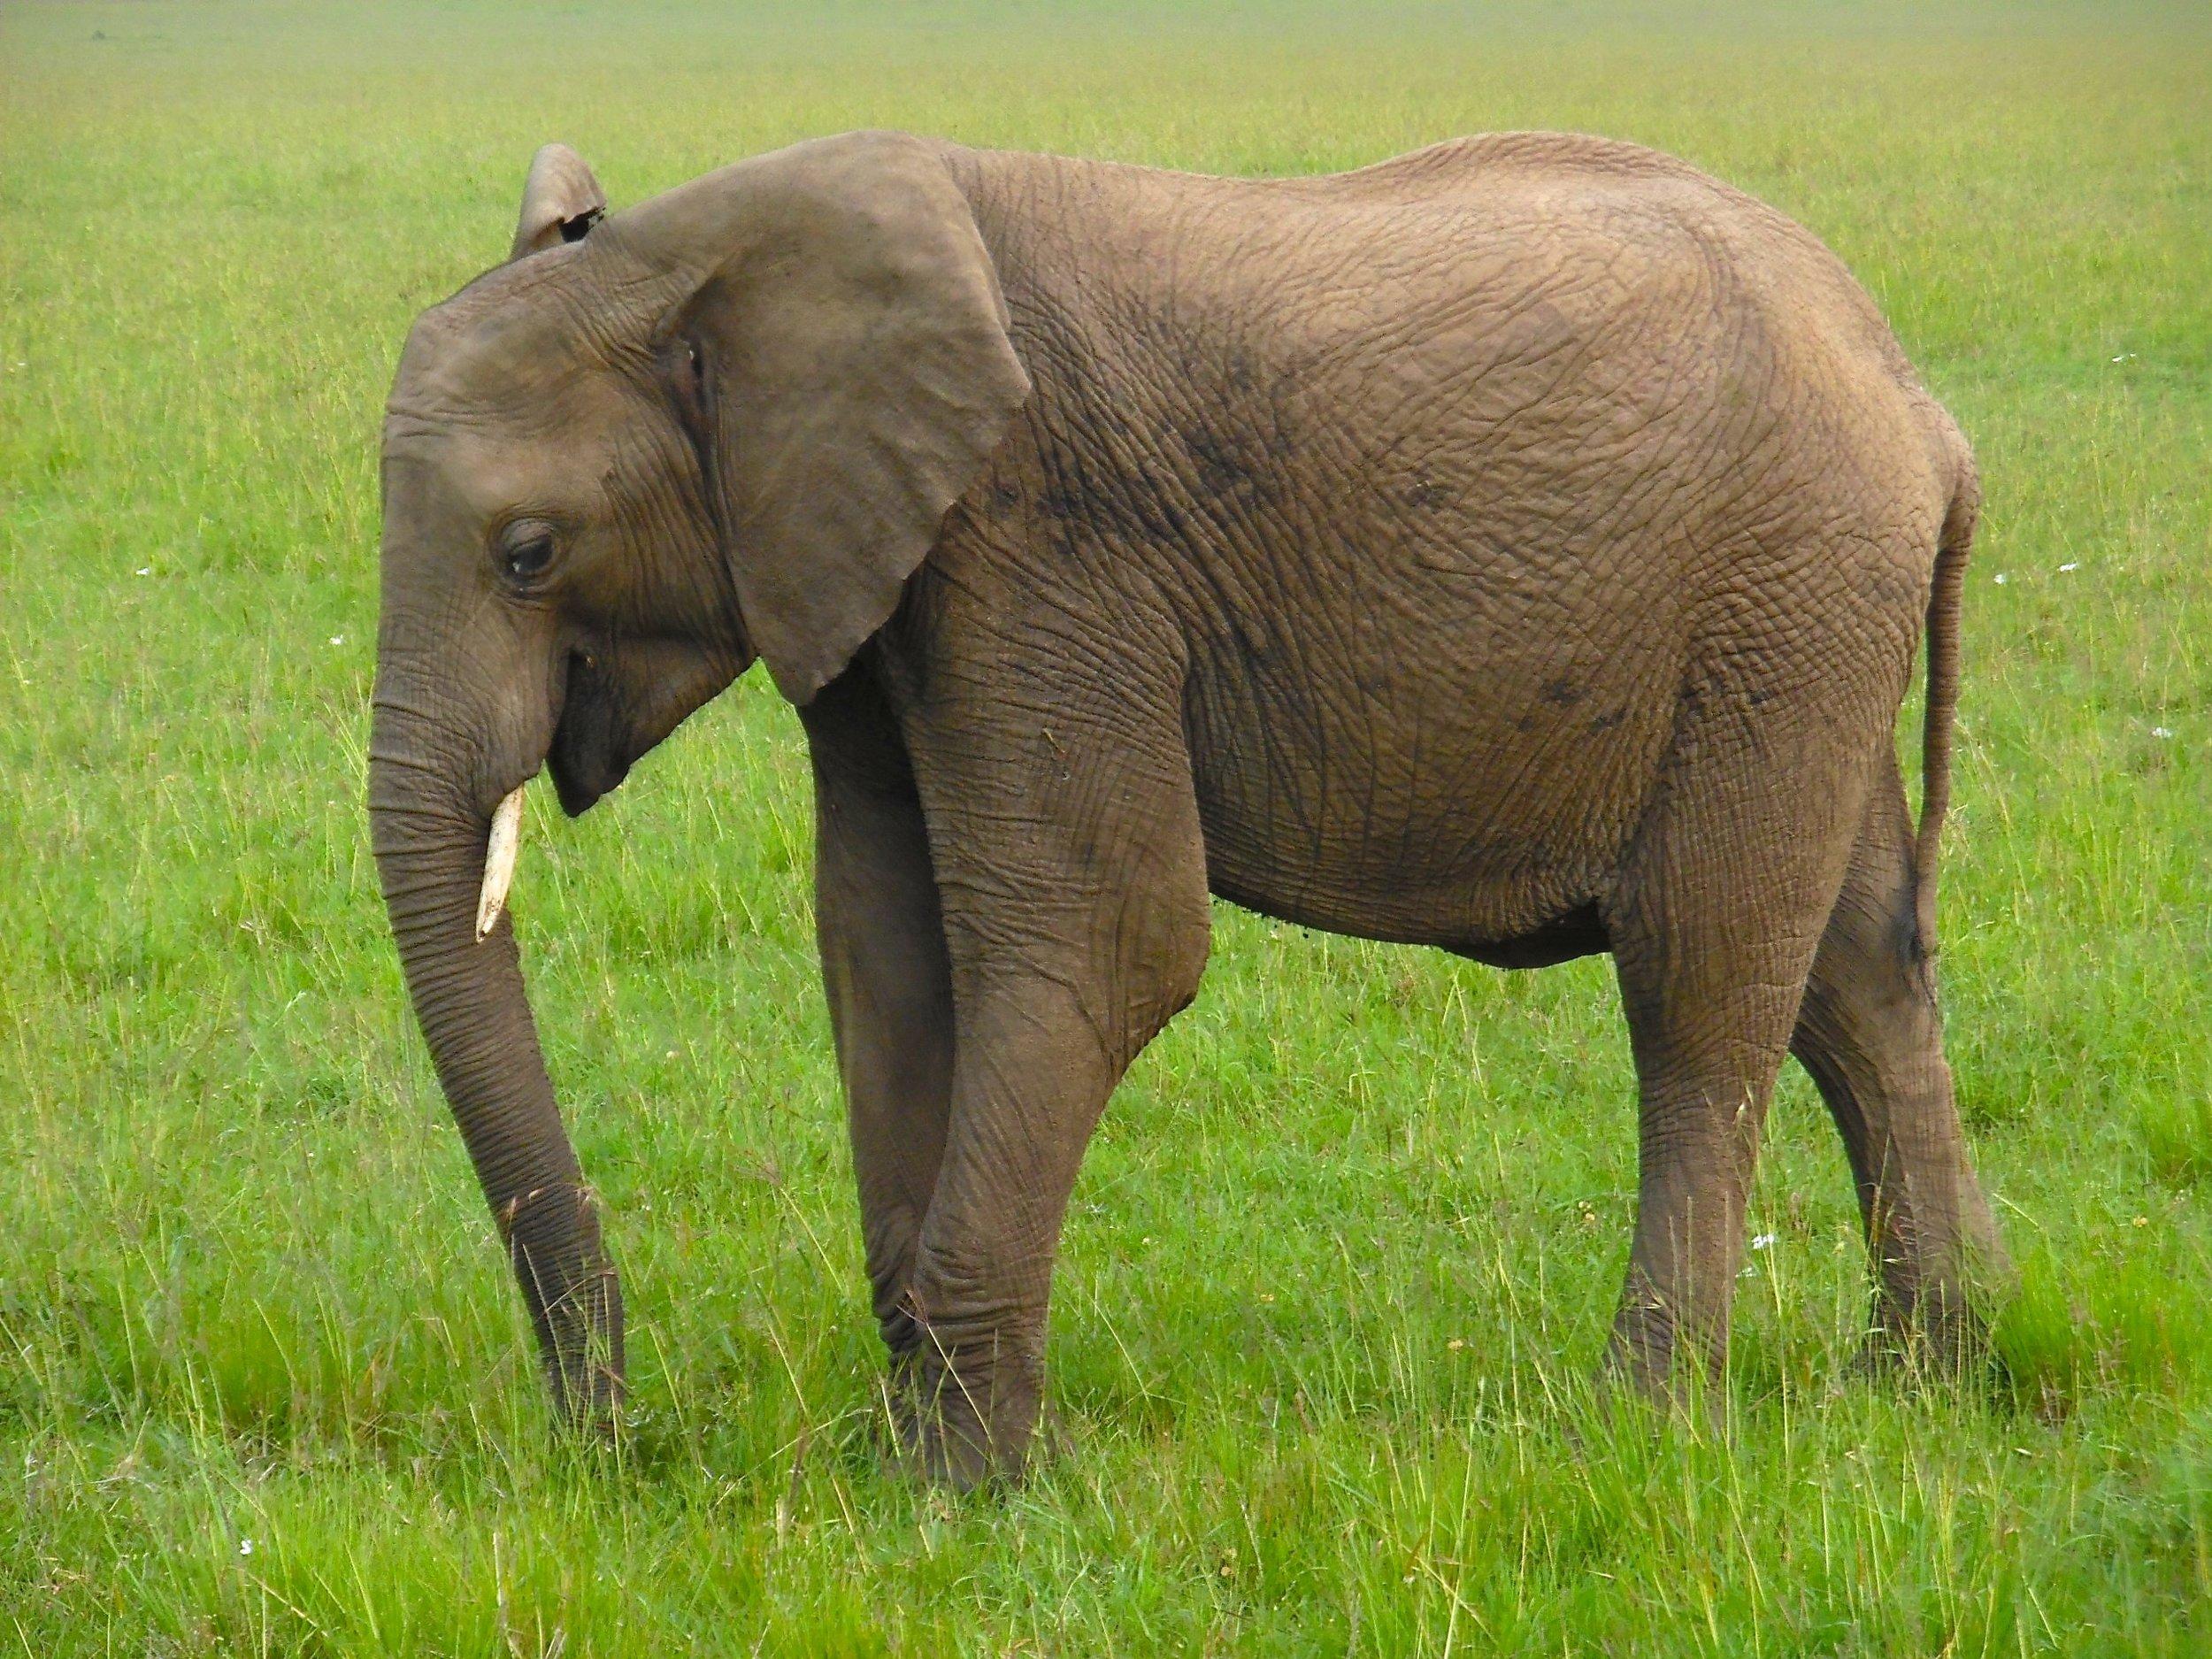 Elephant nice2.jpg